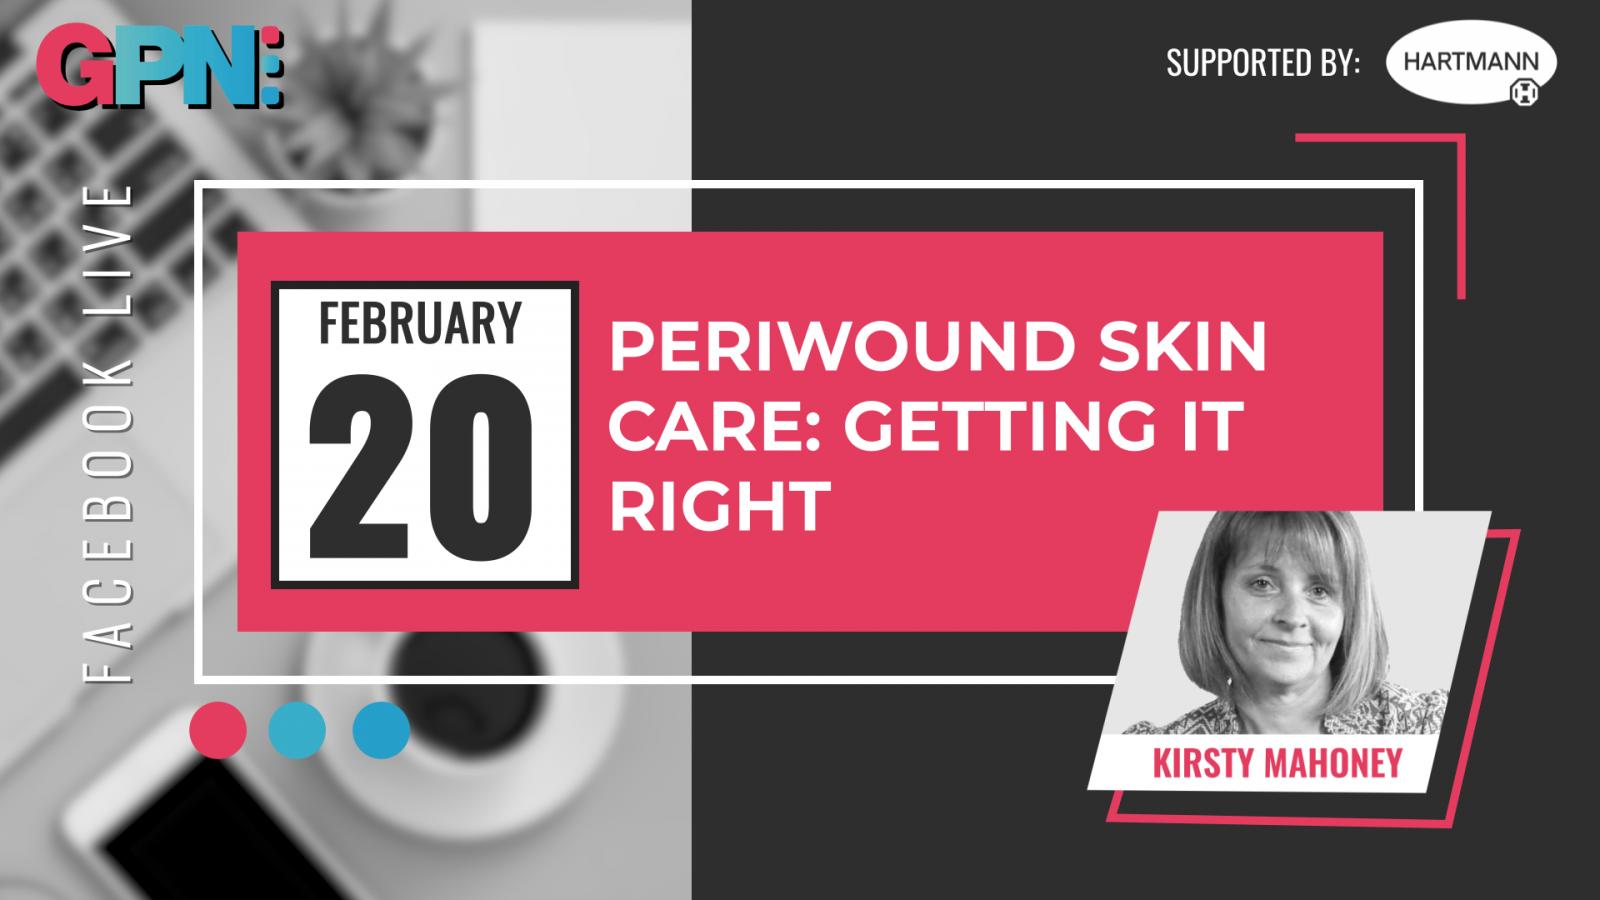 Periwound skin care: getting it right